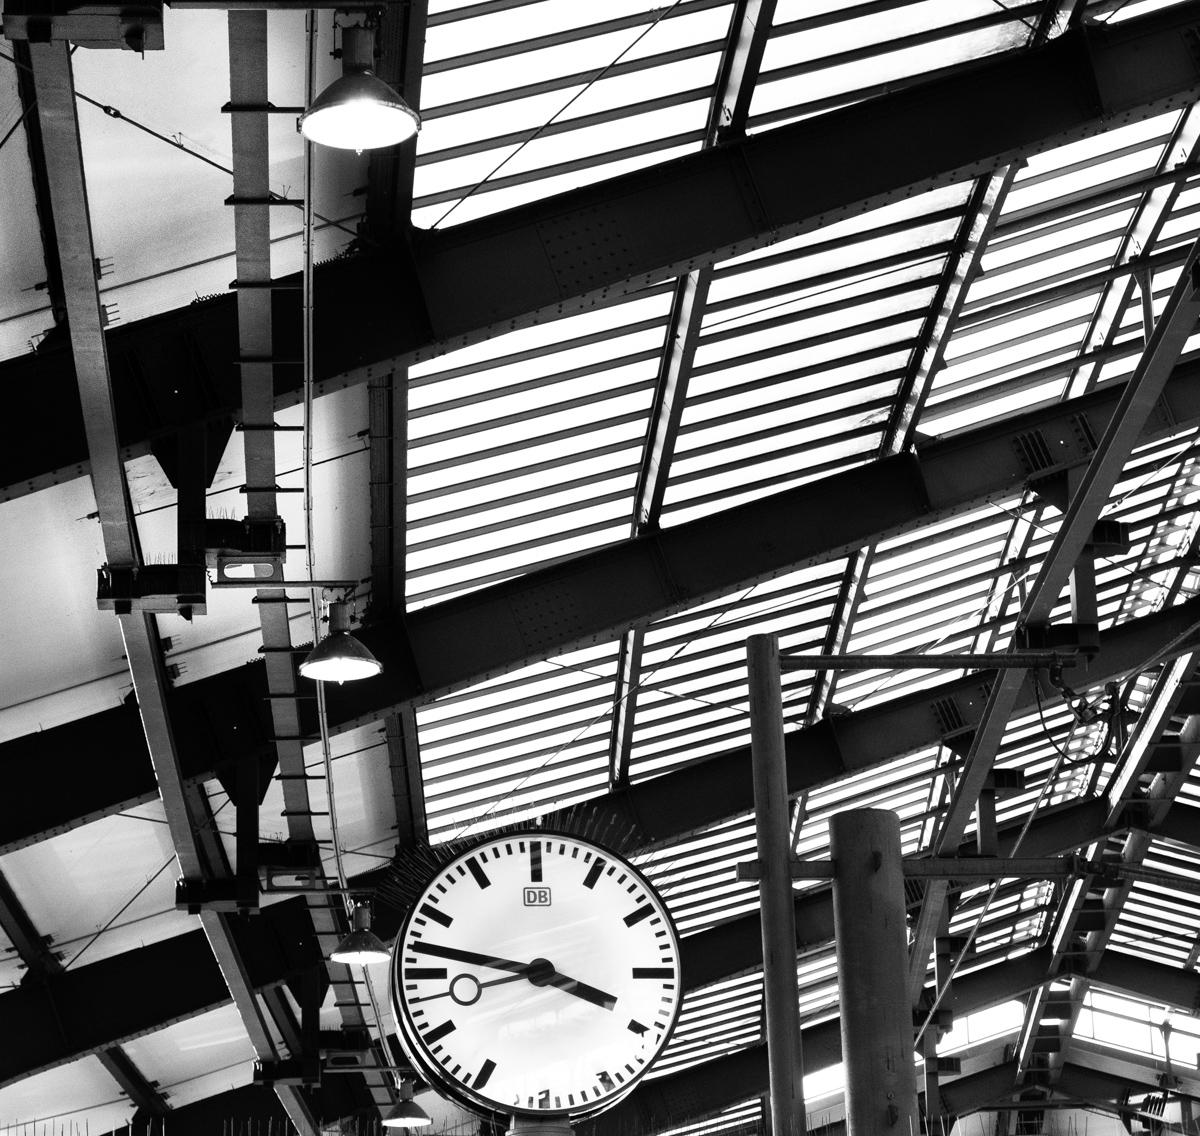 The clock on platform 3